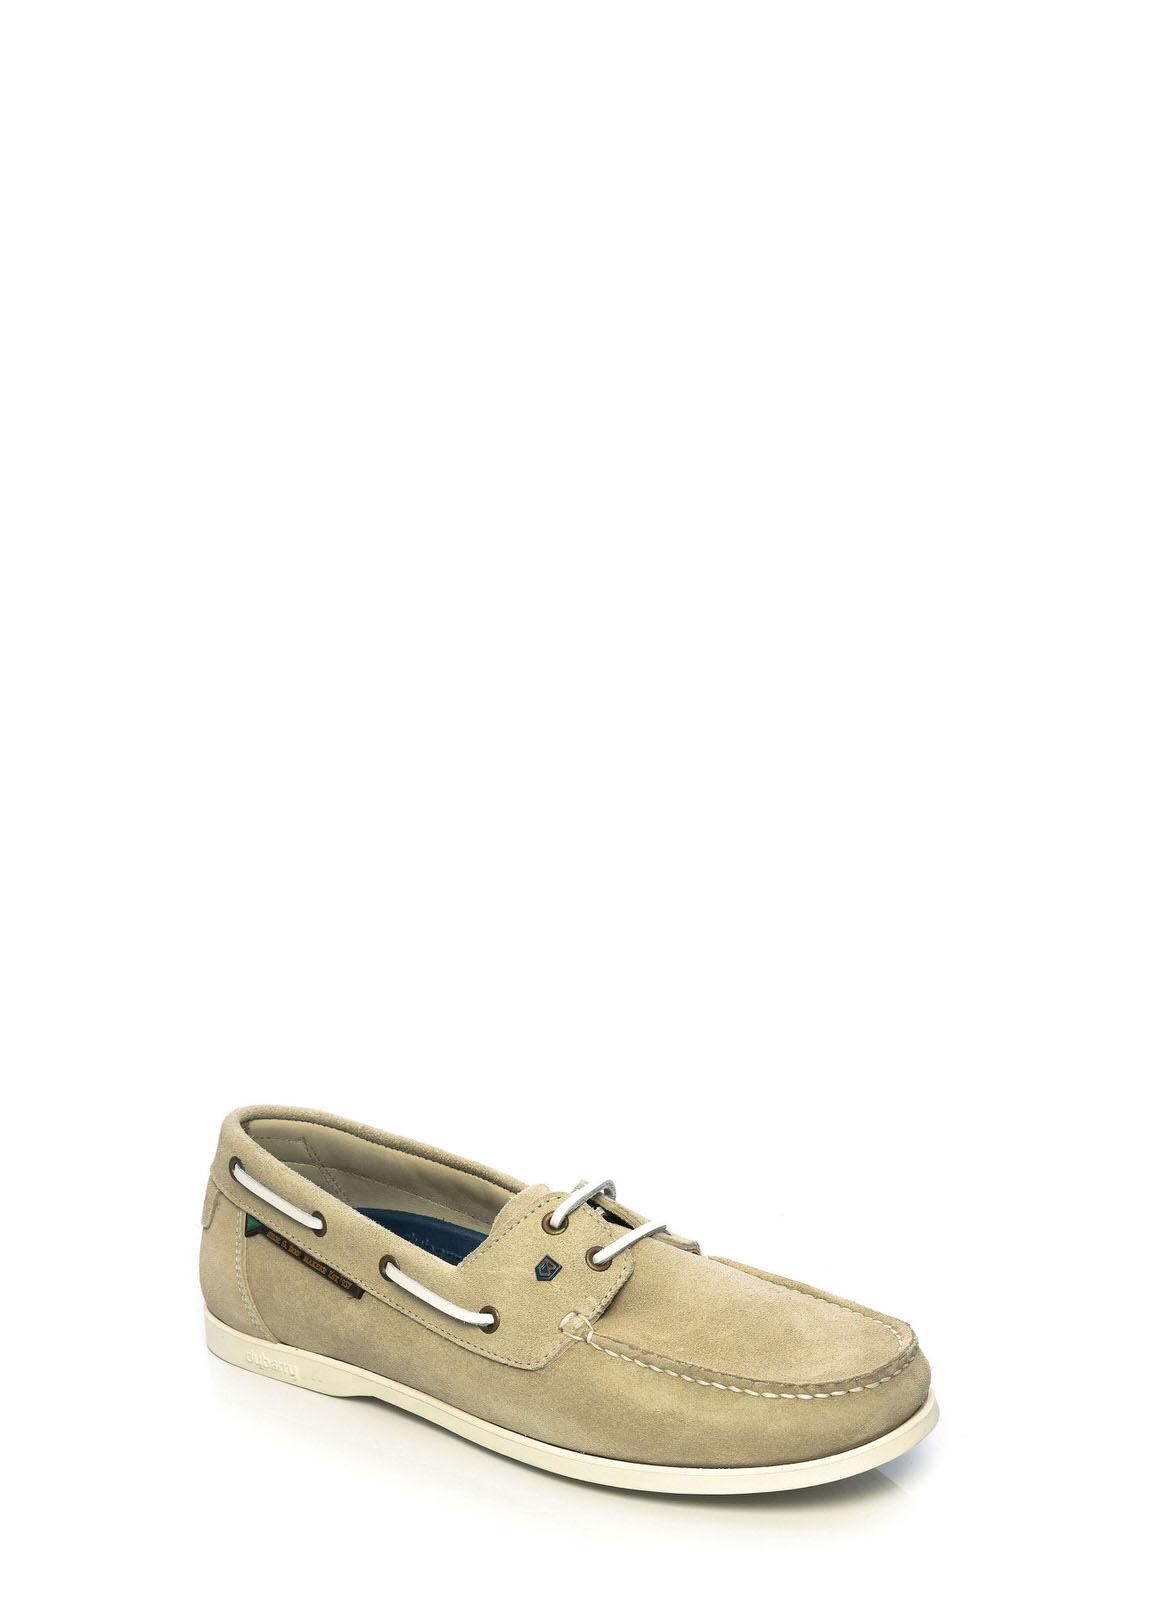 Dubarry_ Windward Mens Deck Shoe - Oyster_Image_1